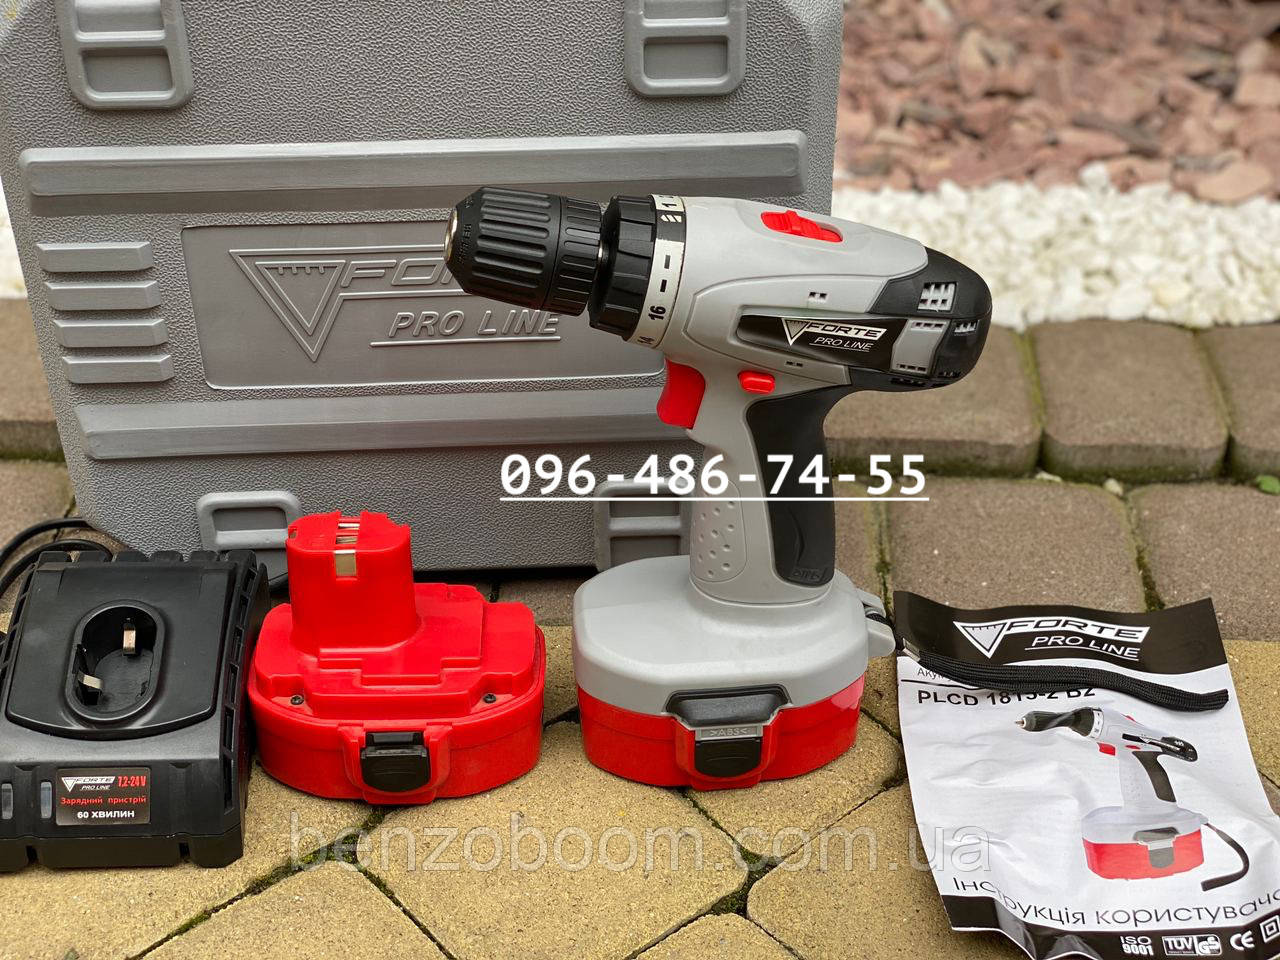 Шуруповерт аккумуляторный Forte PLCD 1815-2 B2 18 вольт